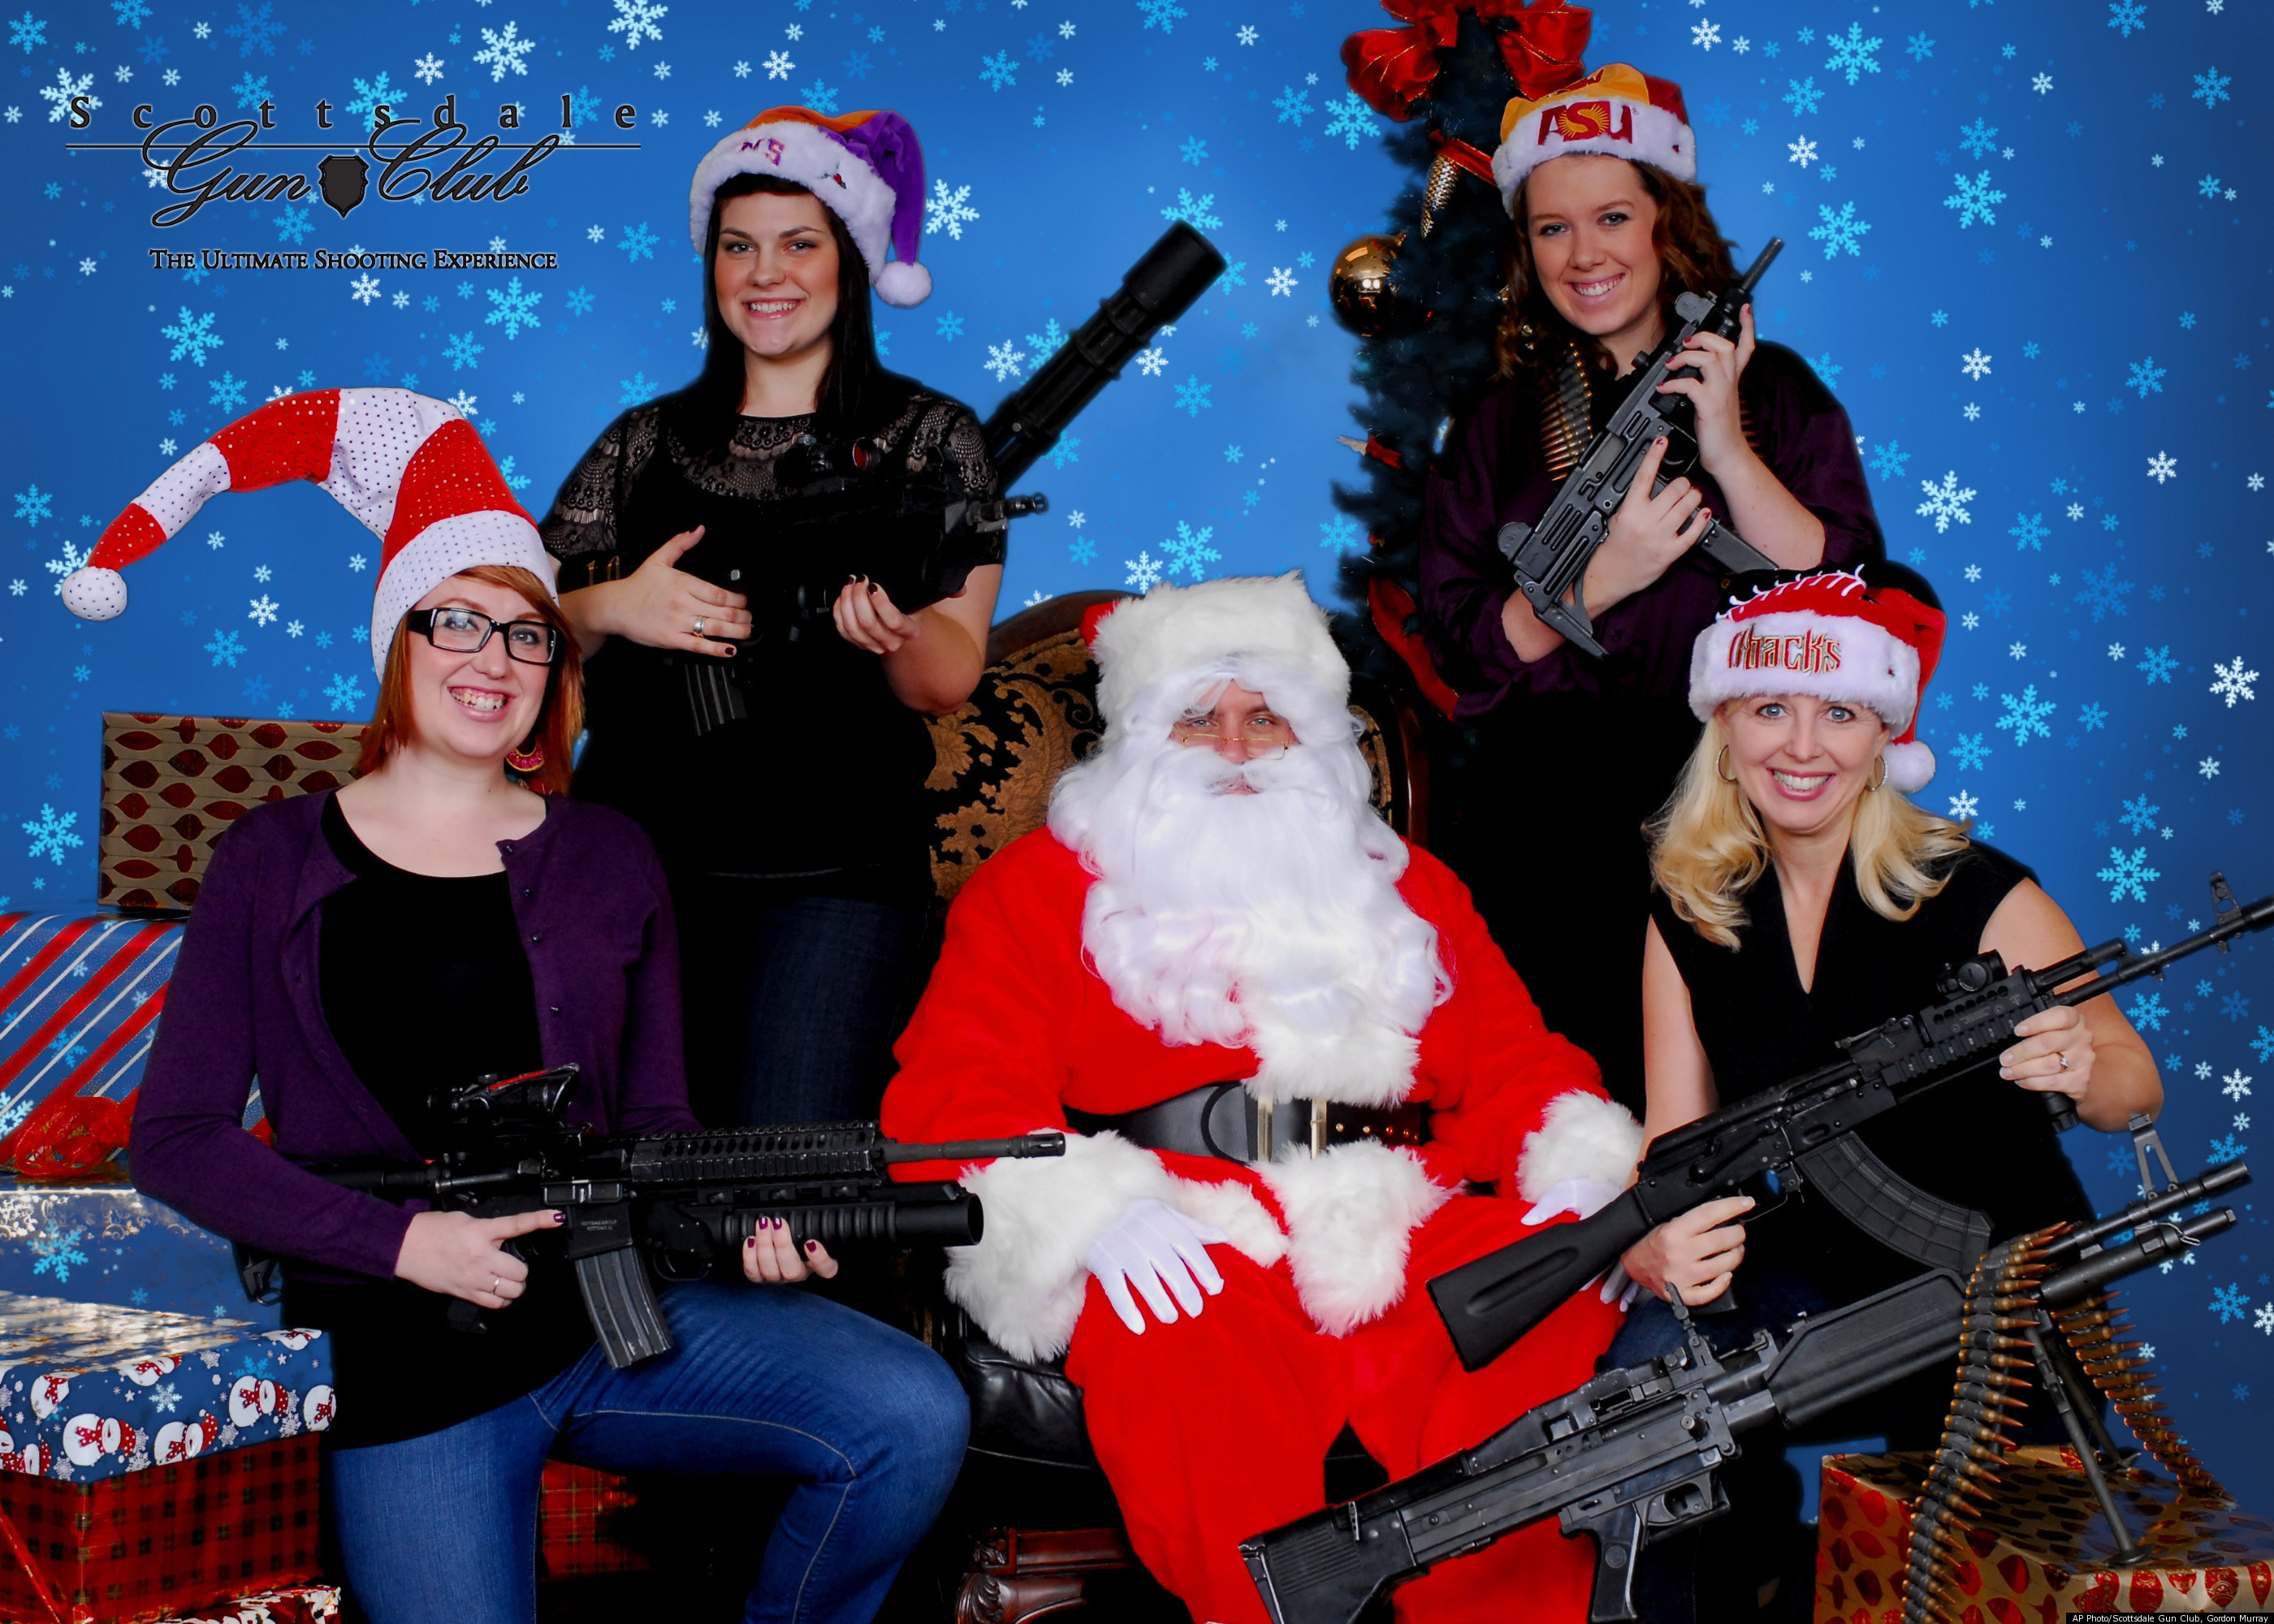 Captivating Machine Guns And Santa Claus: Arizona Gun Club Offers Alternative Christmas  Photoshoot (Pictures)